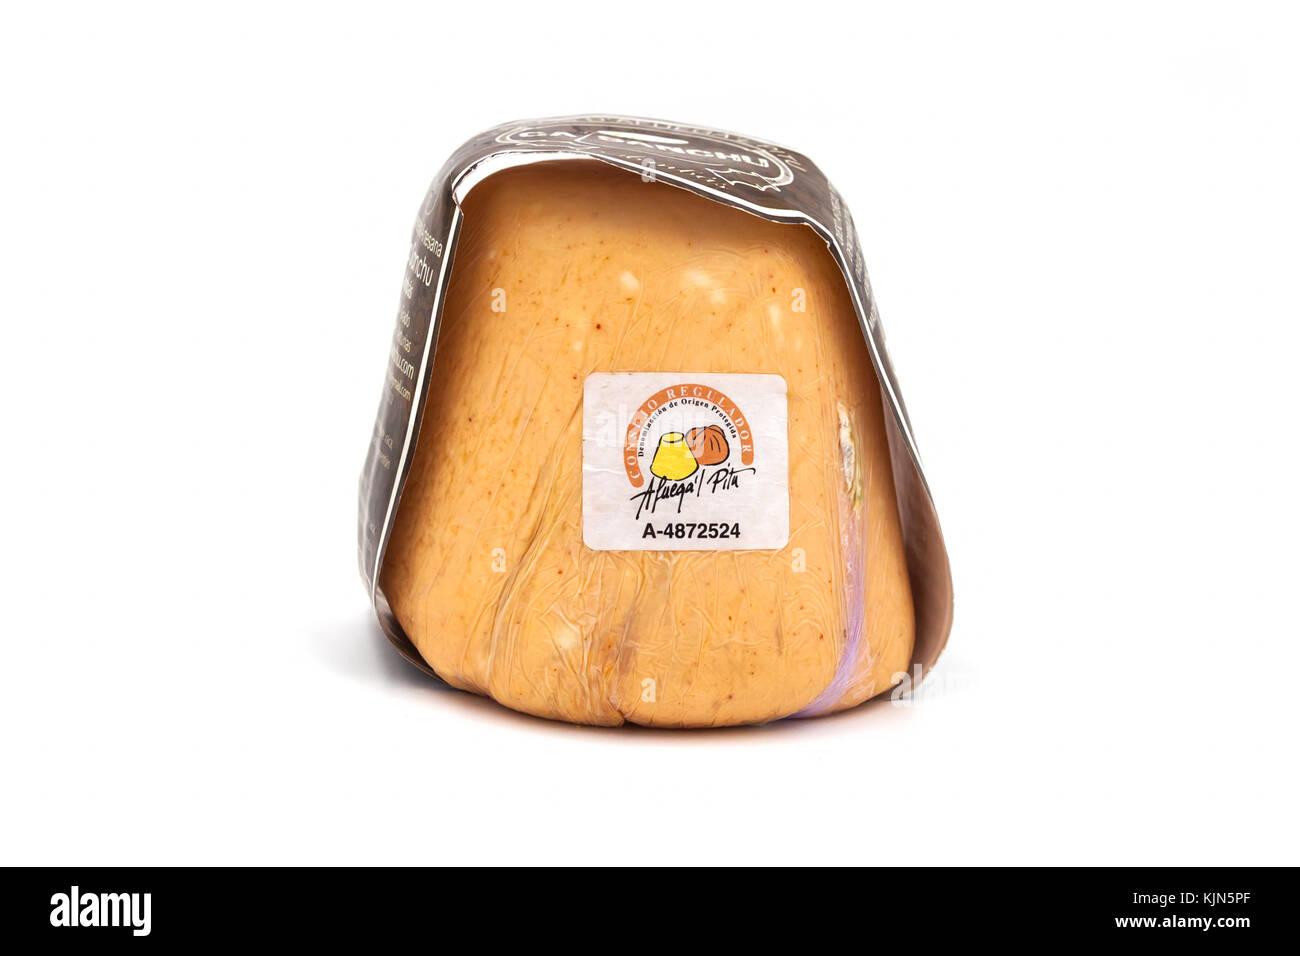 Asturian Afuega'l pitu cheese isolated on white background - Stock Image